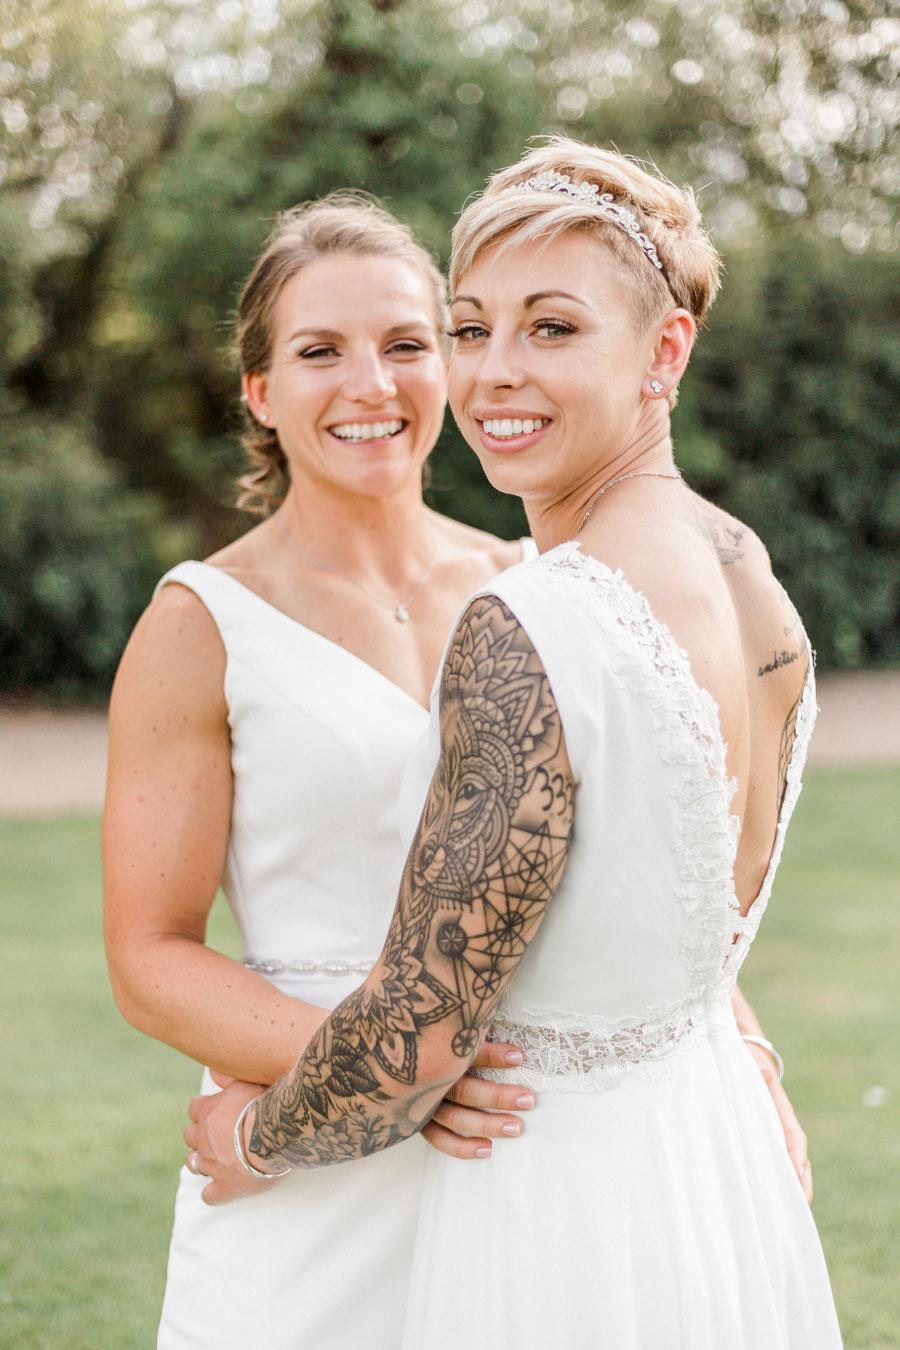 Tewin Bury farm wedding blog, photo credit Absolute Photo UK (30)